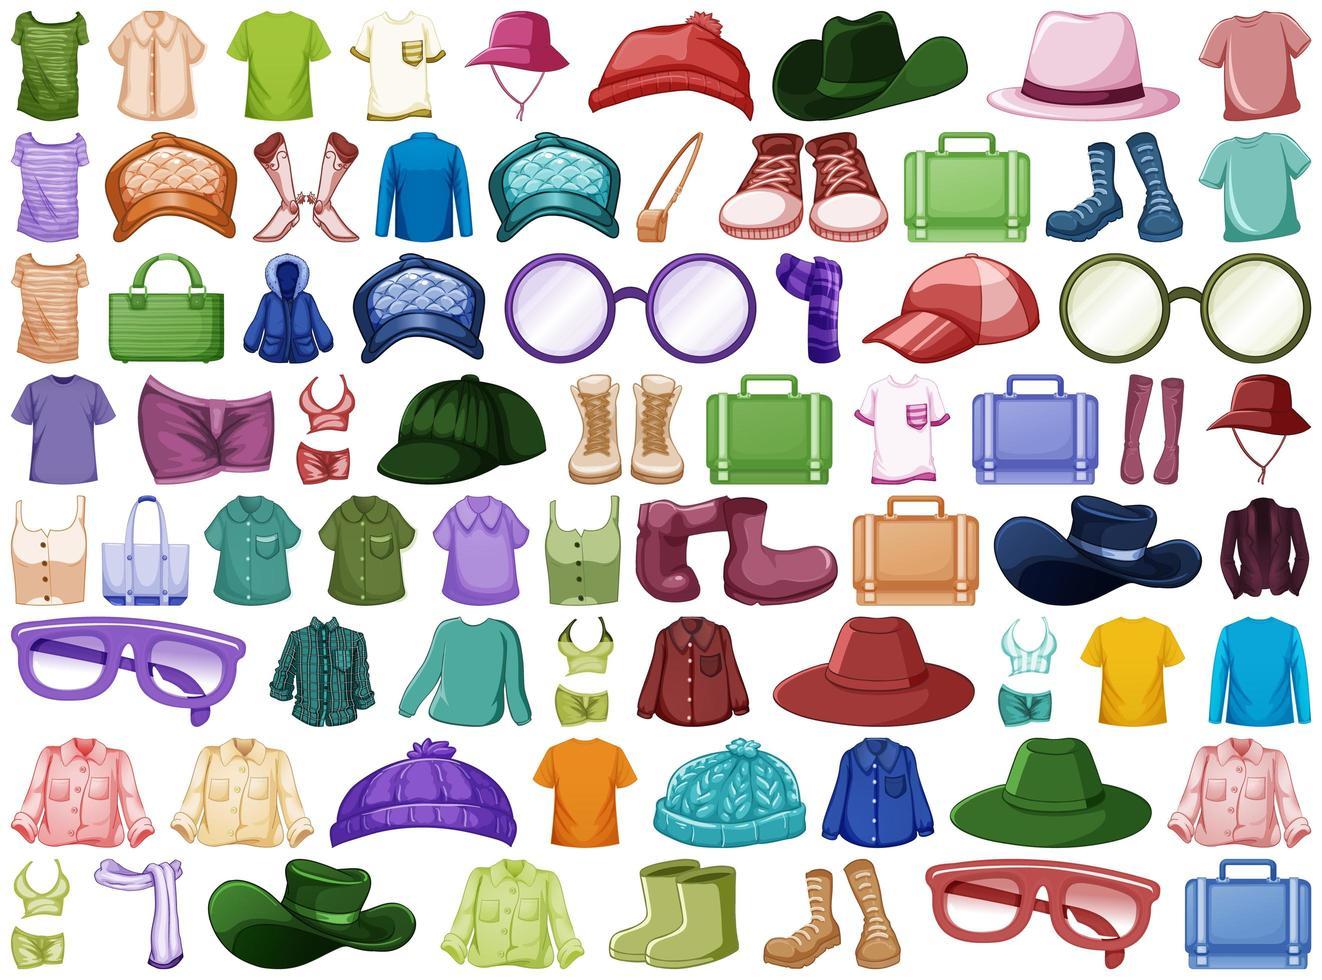 collectie mode-outfits en accessoires vector